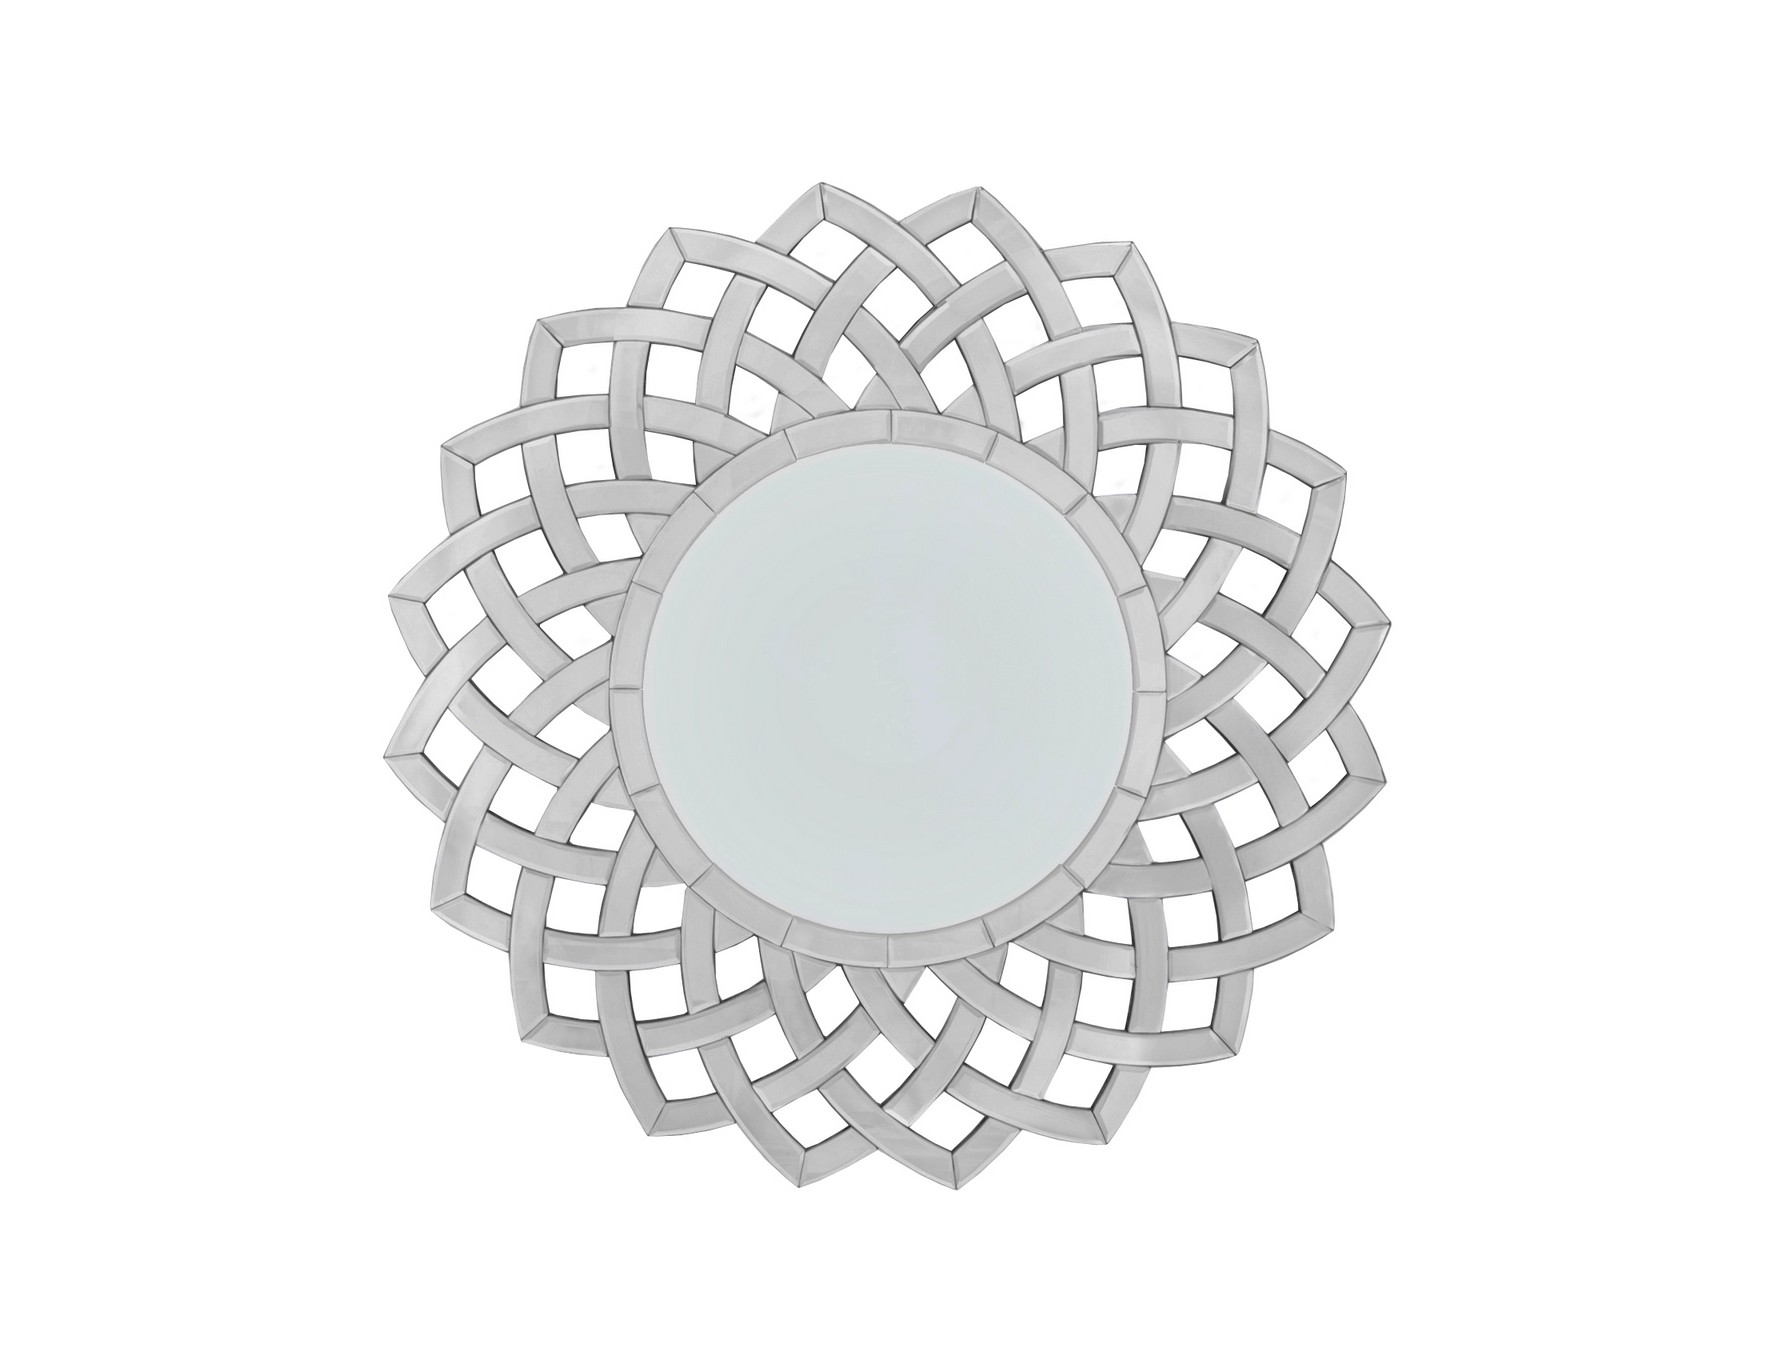 Зеркало TivonaНастенные зеркала<br>Материалы: МДФ, стекло<br><br>Material: МДФ<br>Ширина см: 89<br>Высота см: 89<br>Глубина см: 1